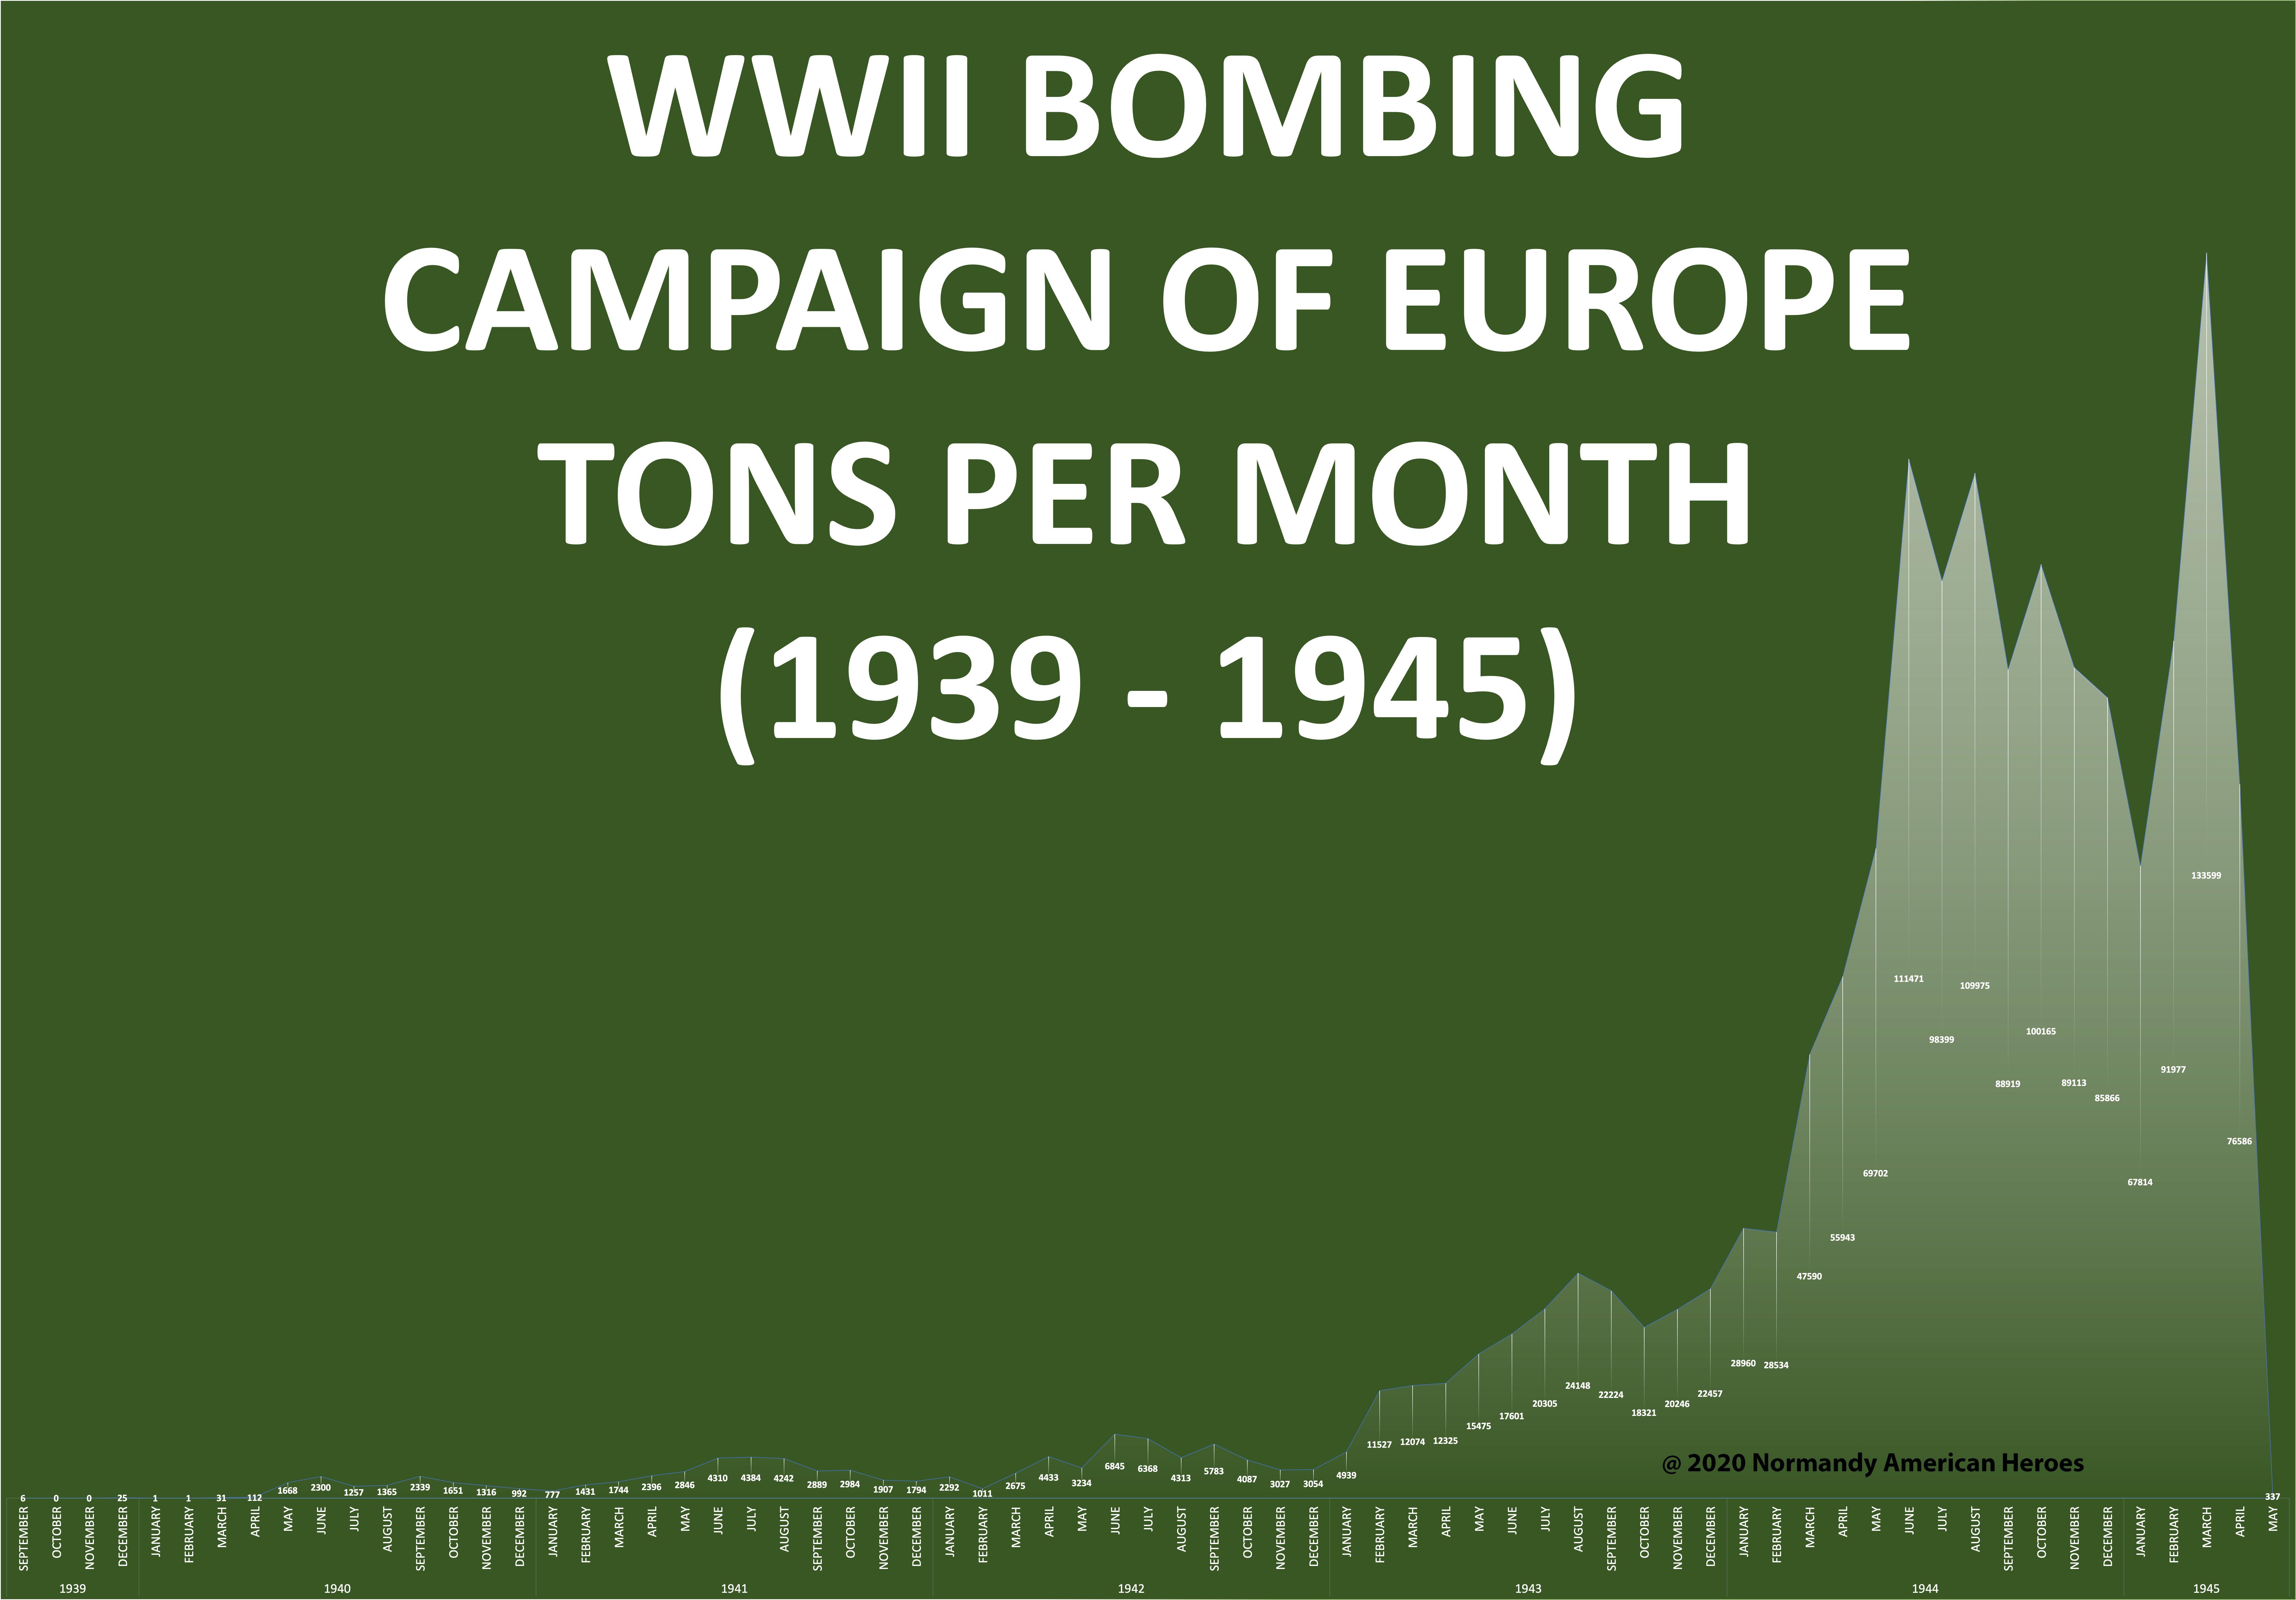 Bombing statistic 1939 - 1945 copy-1